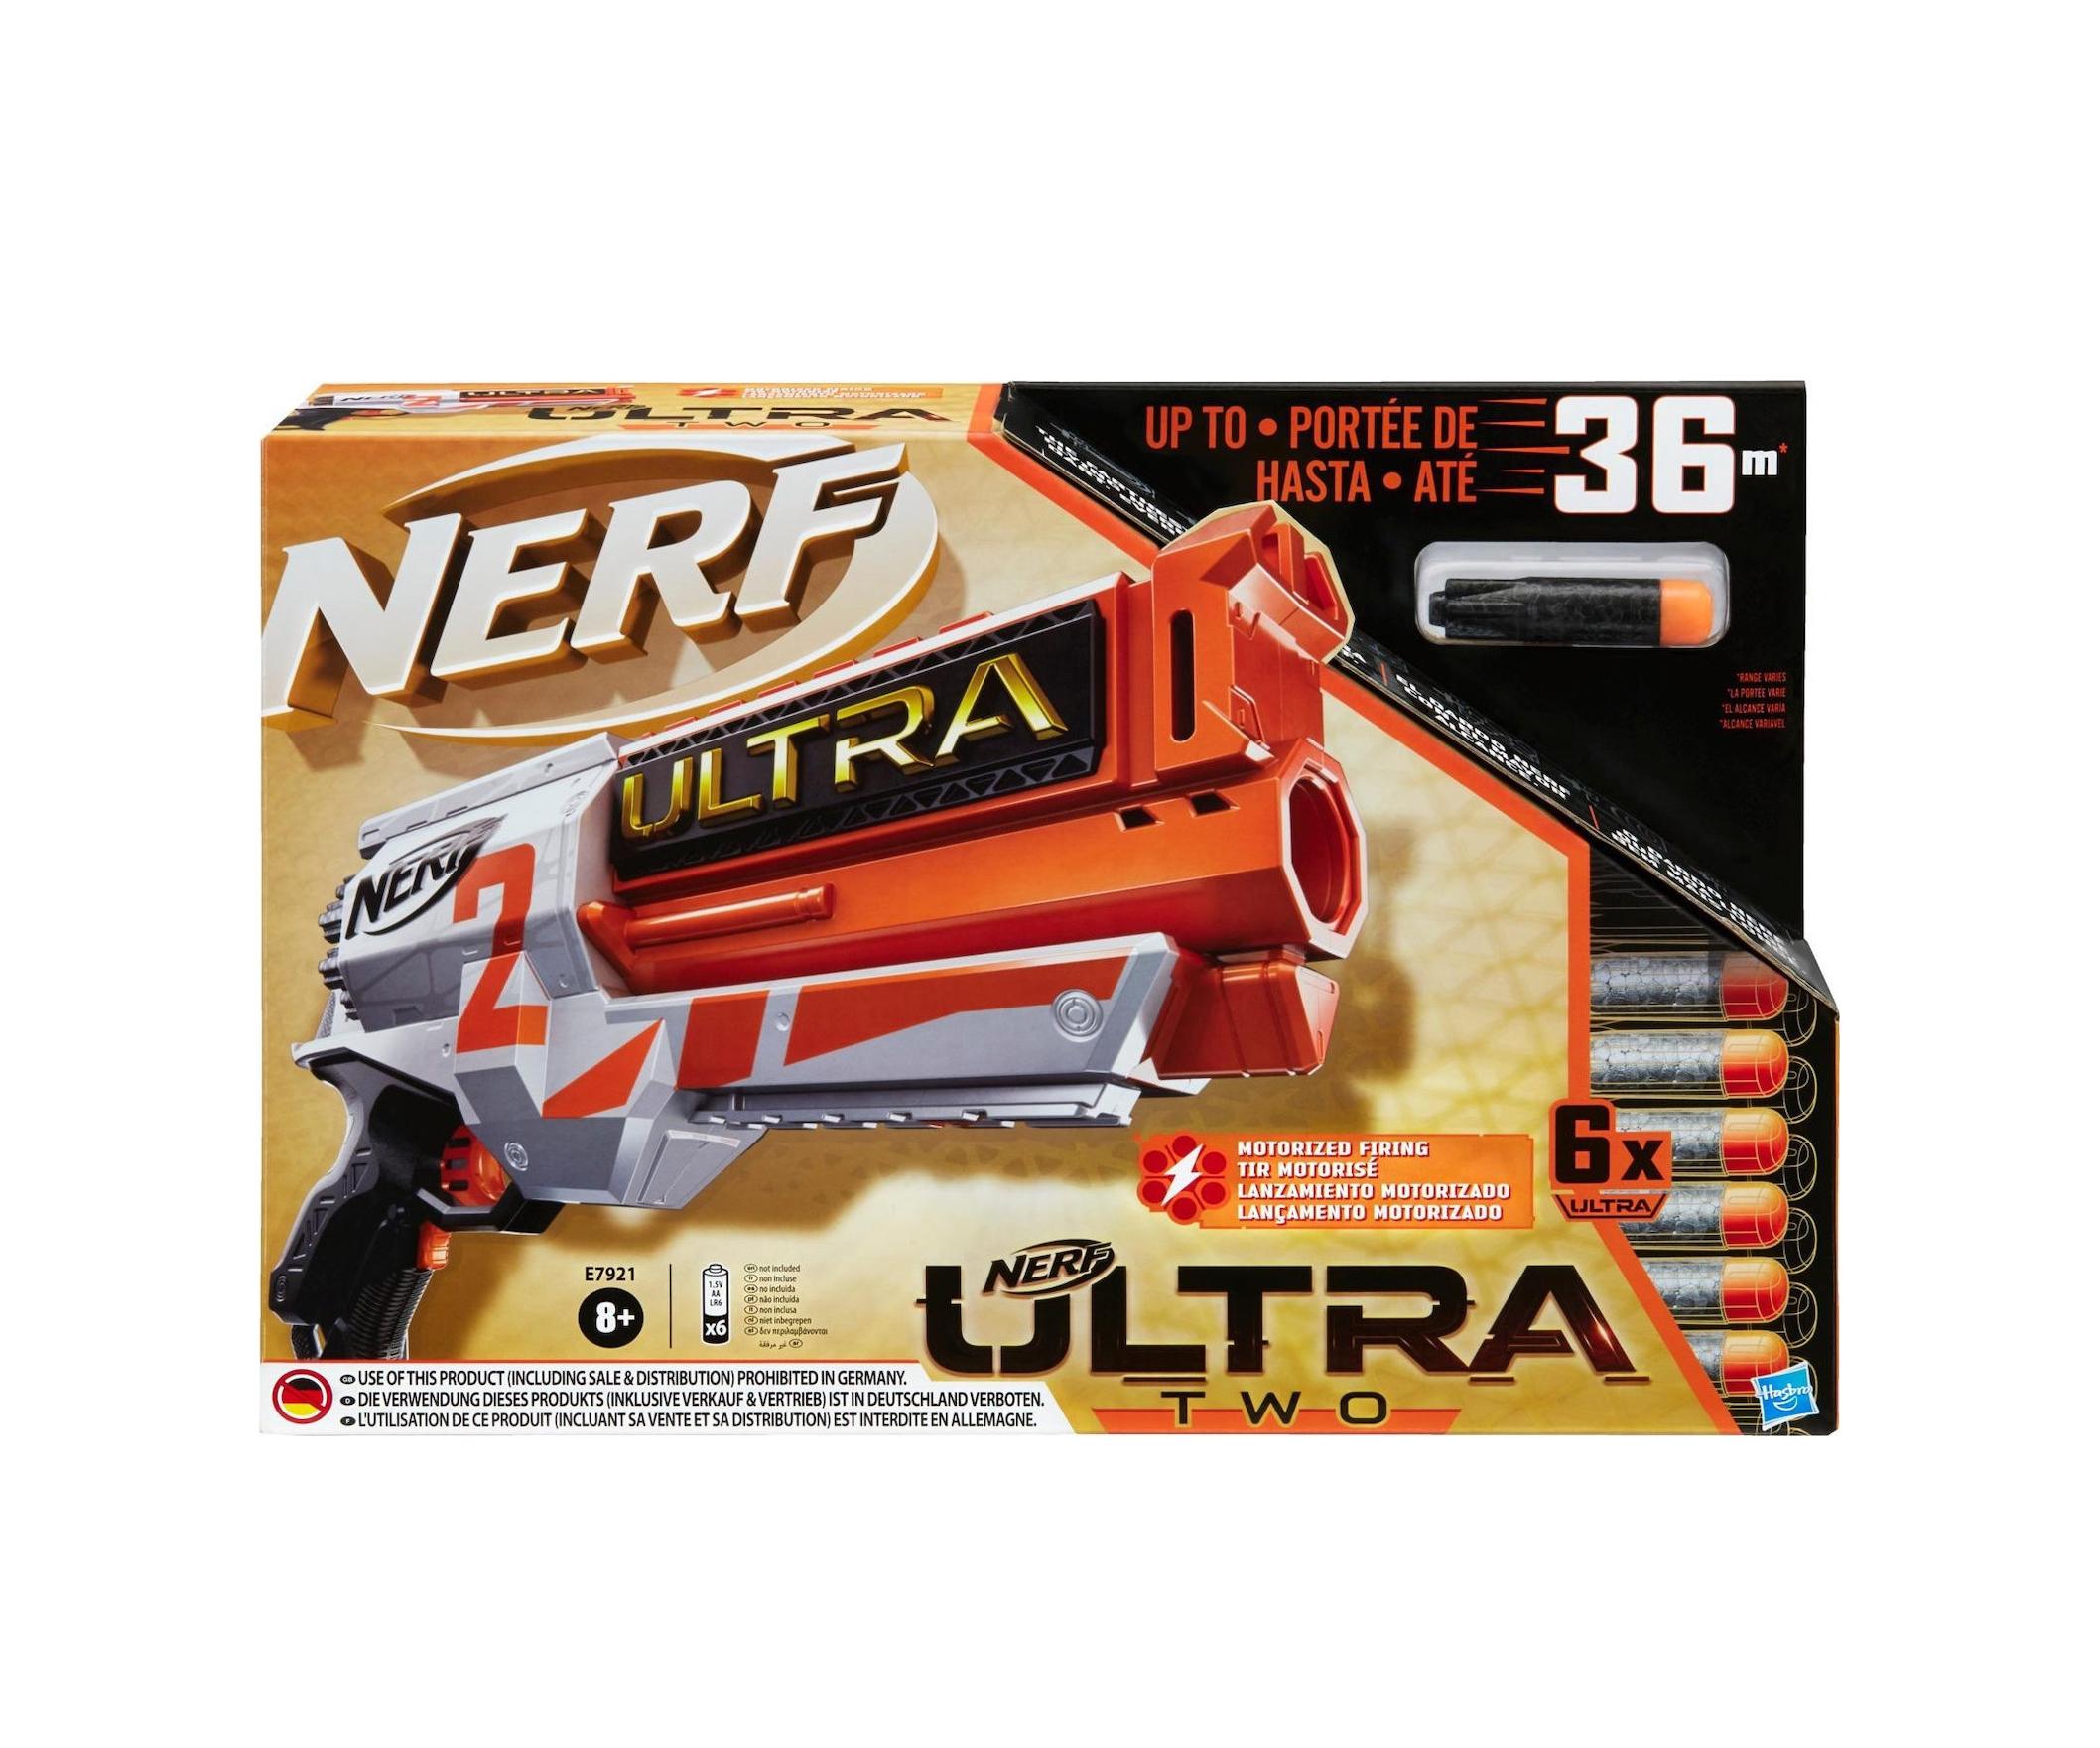 Hasbro Nerf Ultra Two E7921